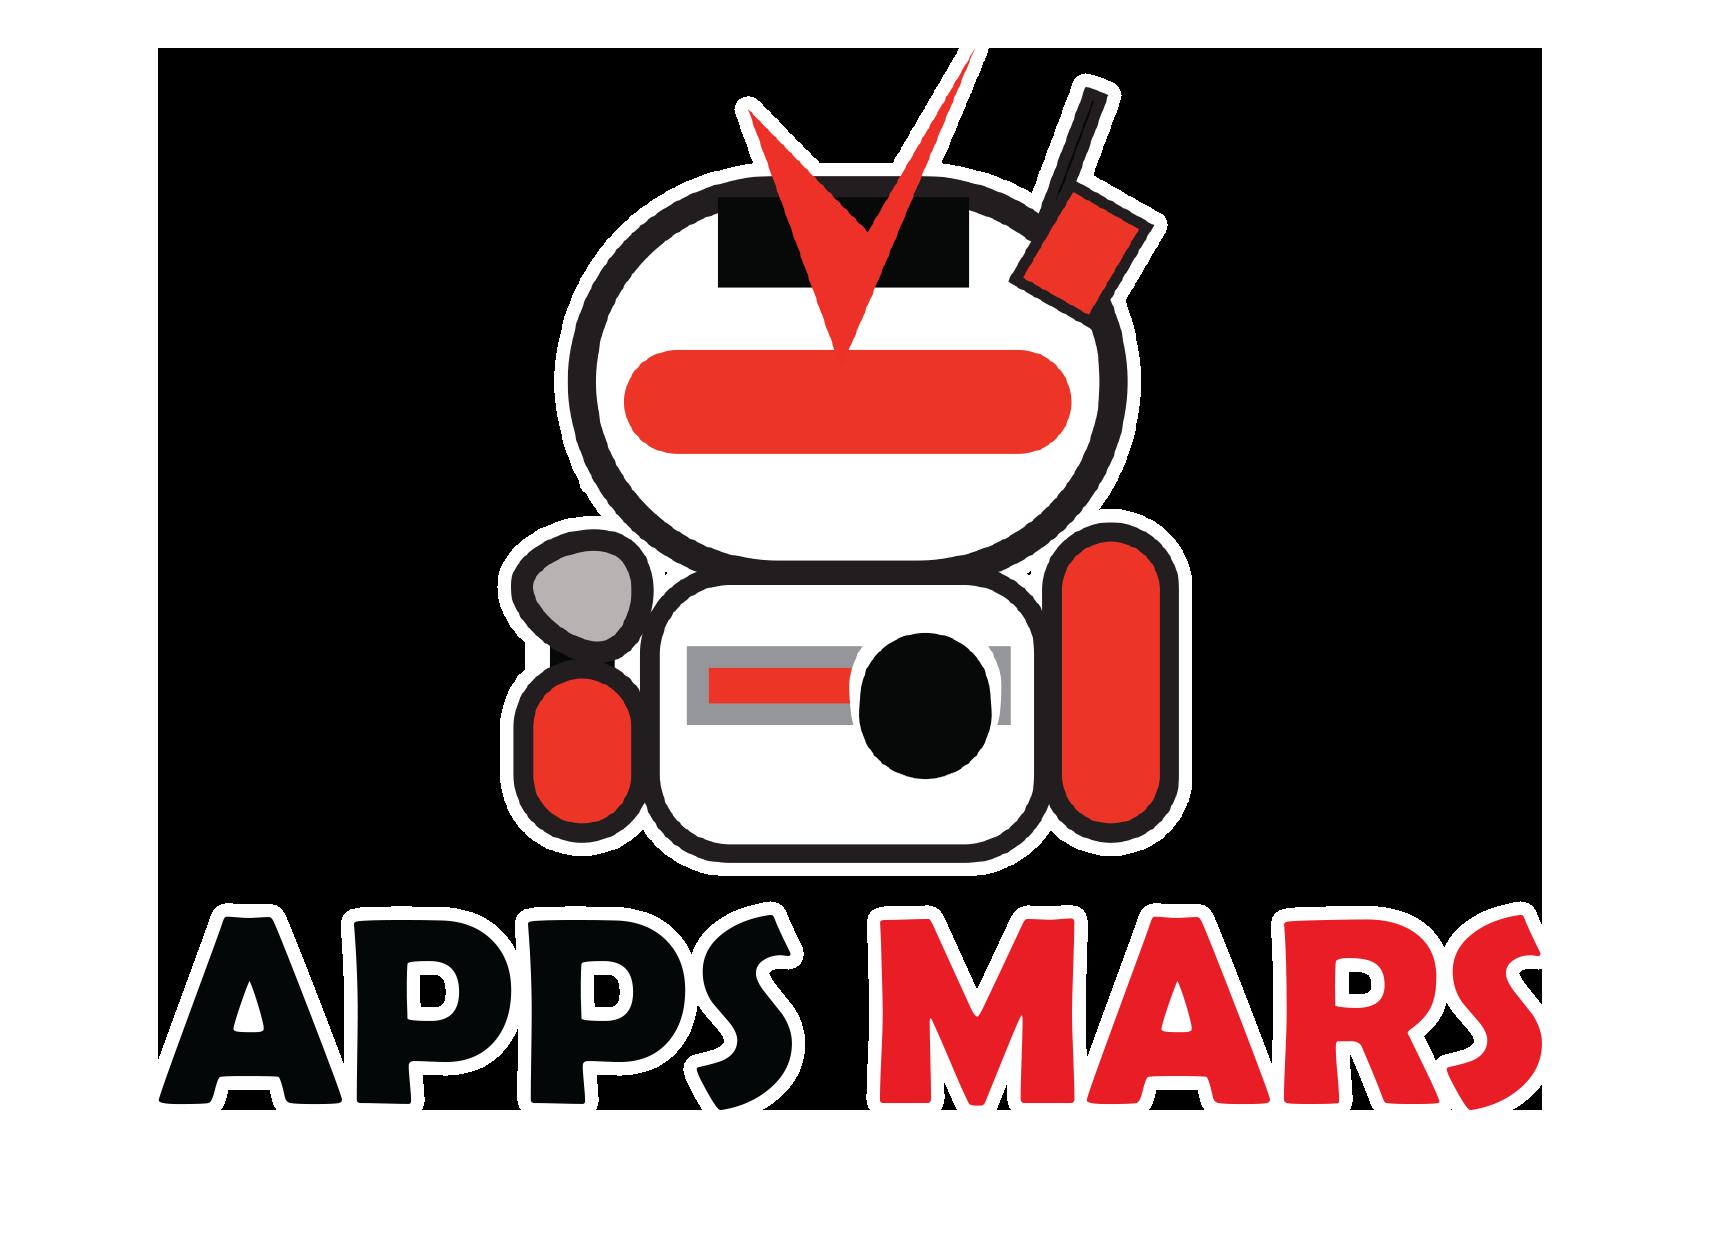 APPS MARS, INC.